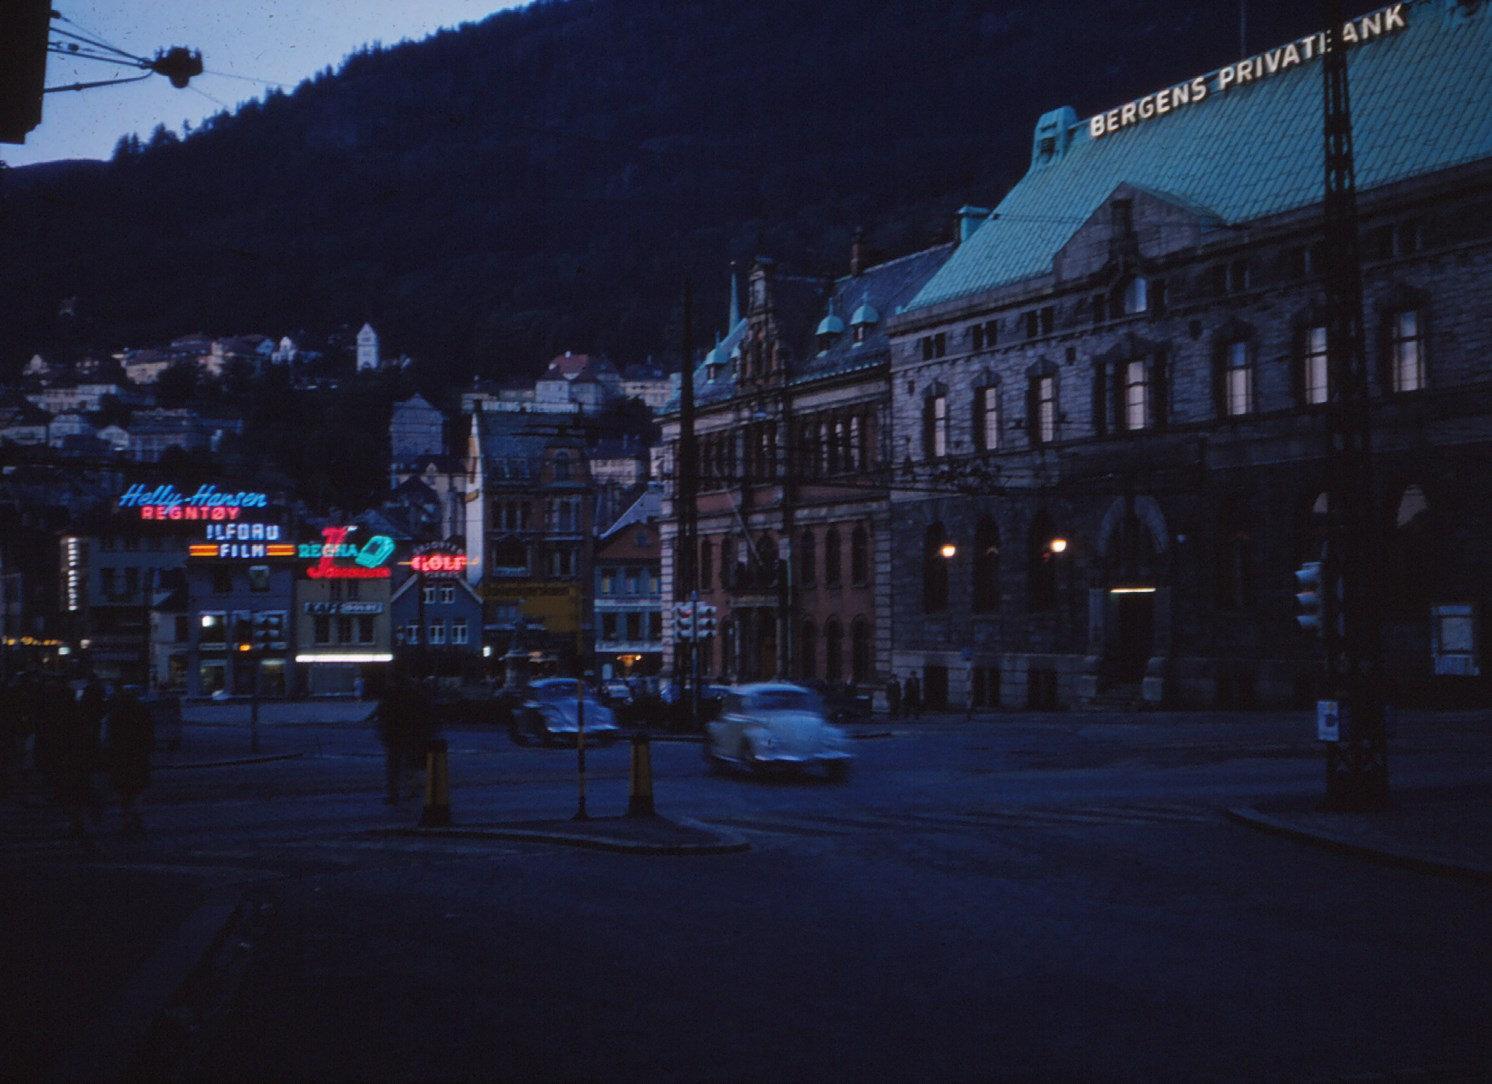 1209 (20) Centrum Bergen